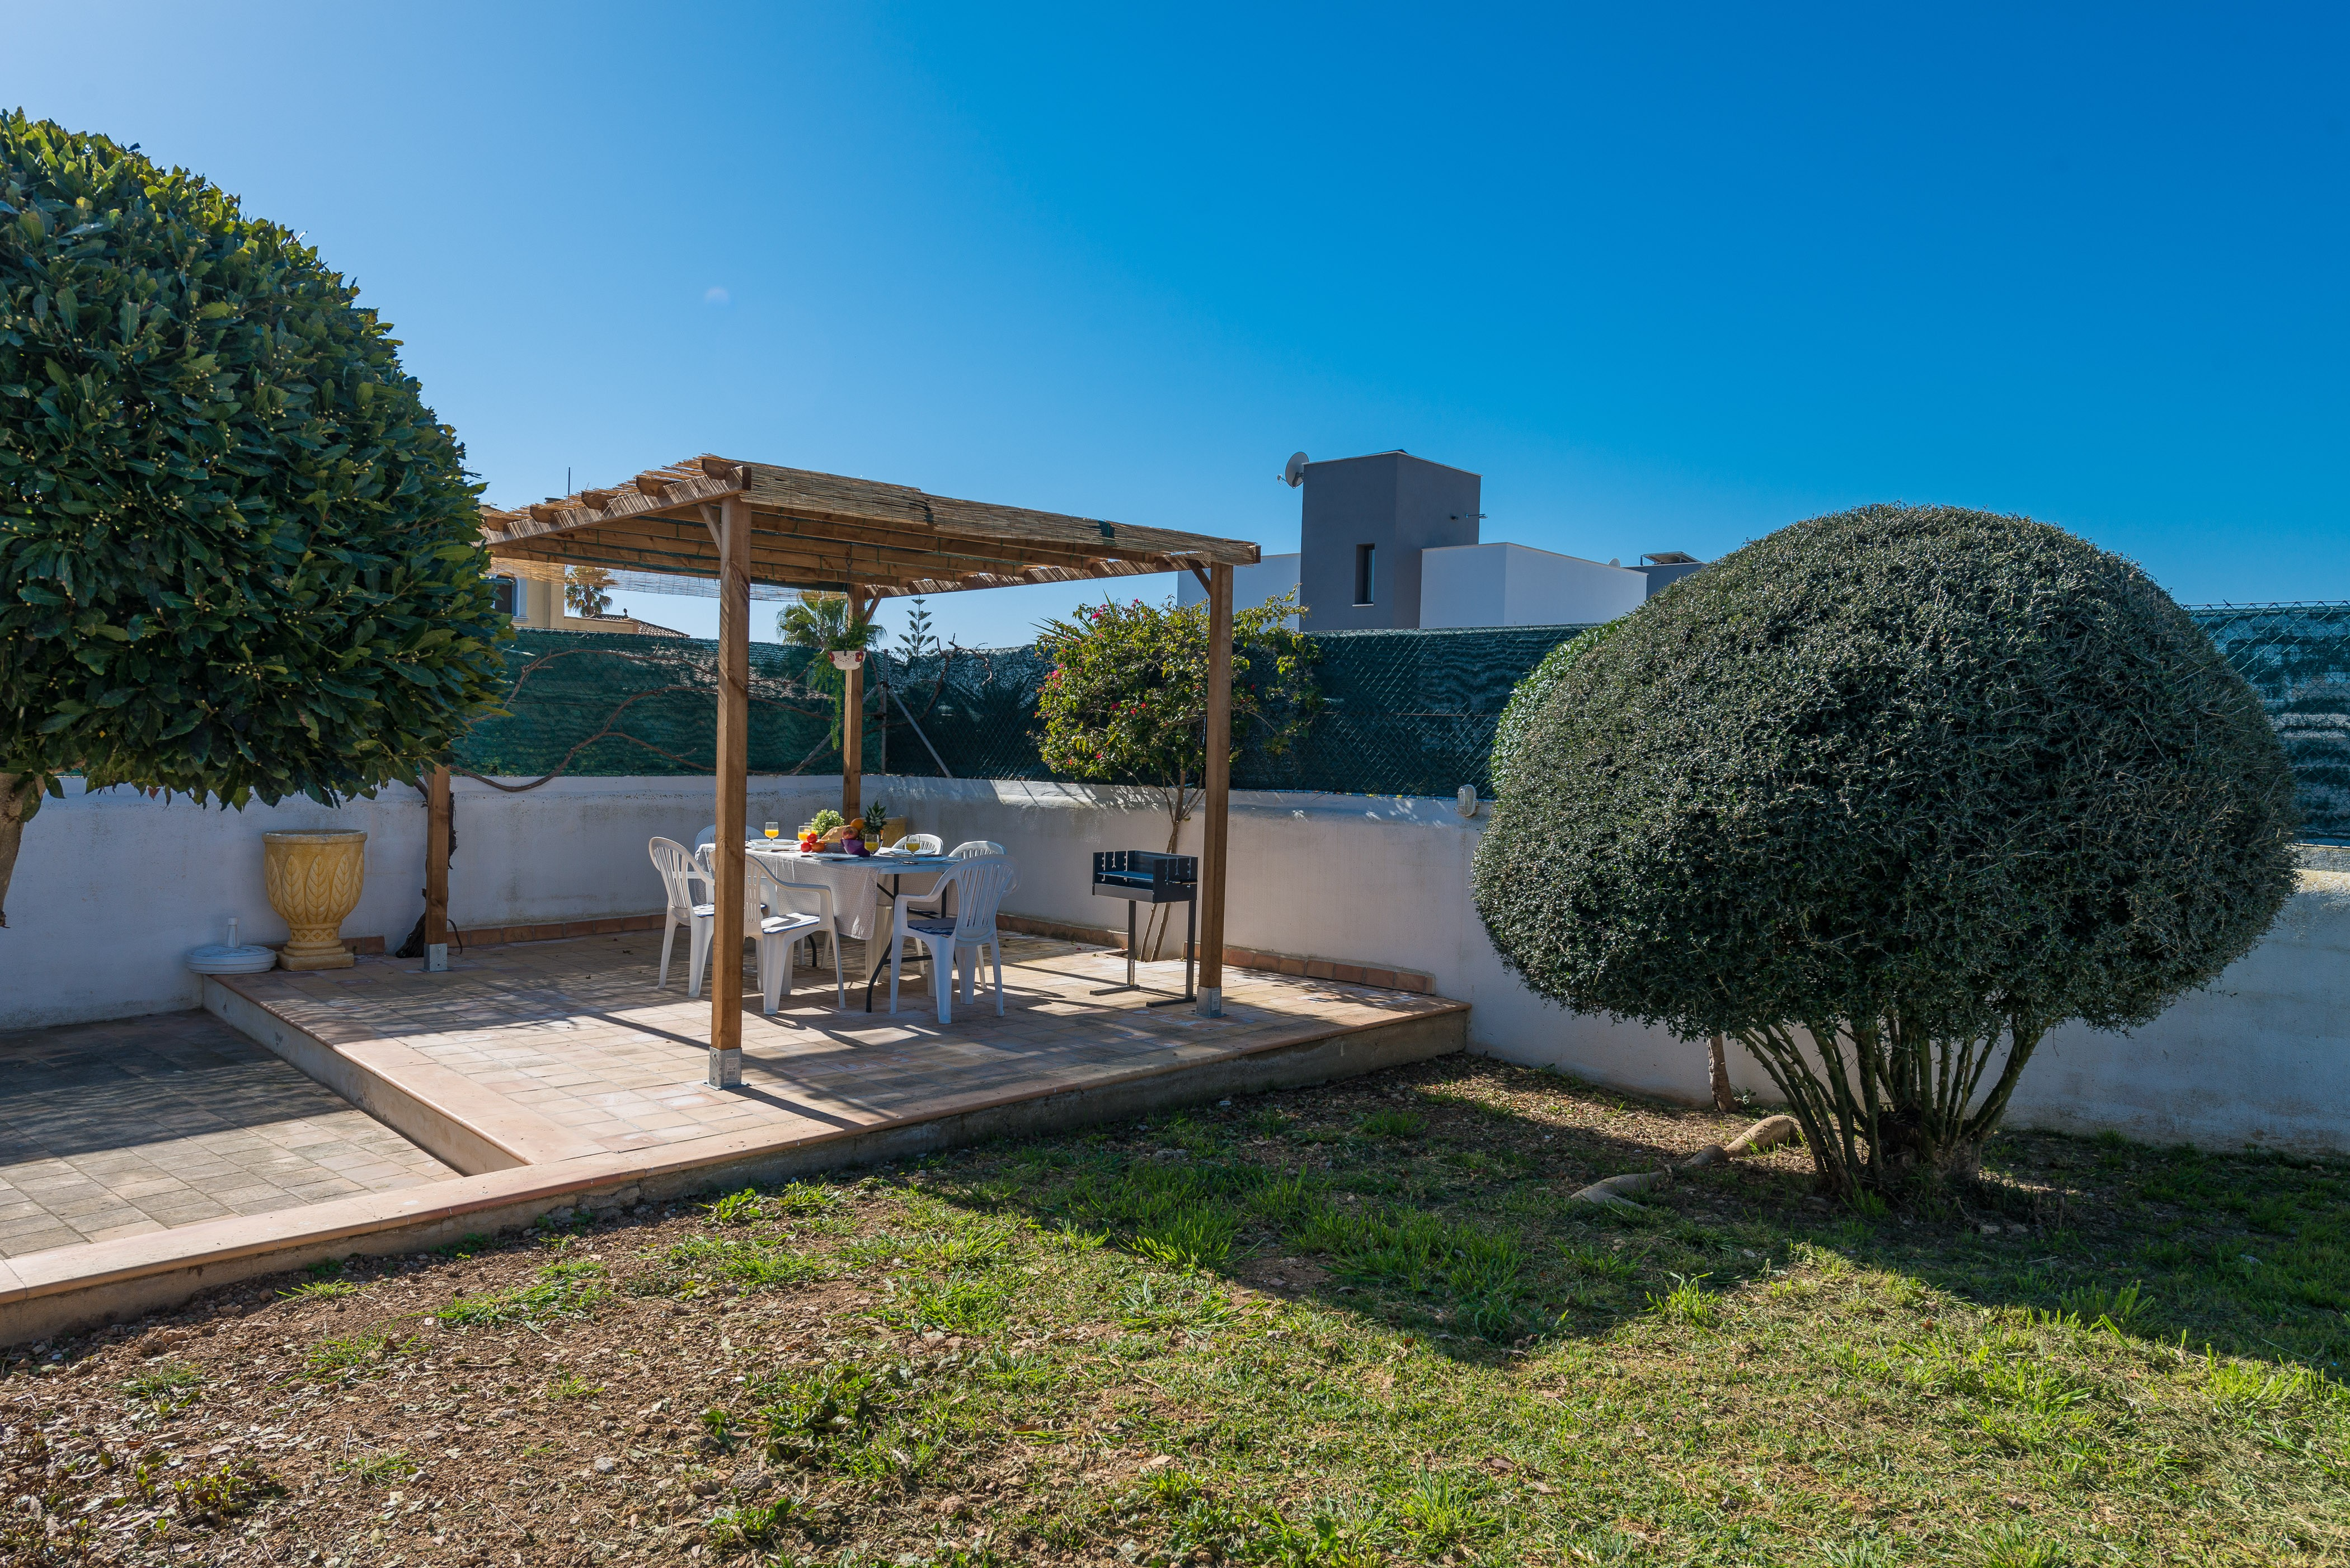 Ferienhaus CAN MOLINA (2063640), Cala Mandia, Mallorca, Balearische Inseln, Spanien, Bild 9